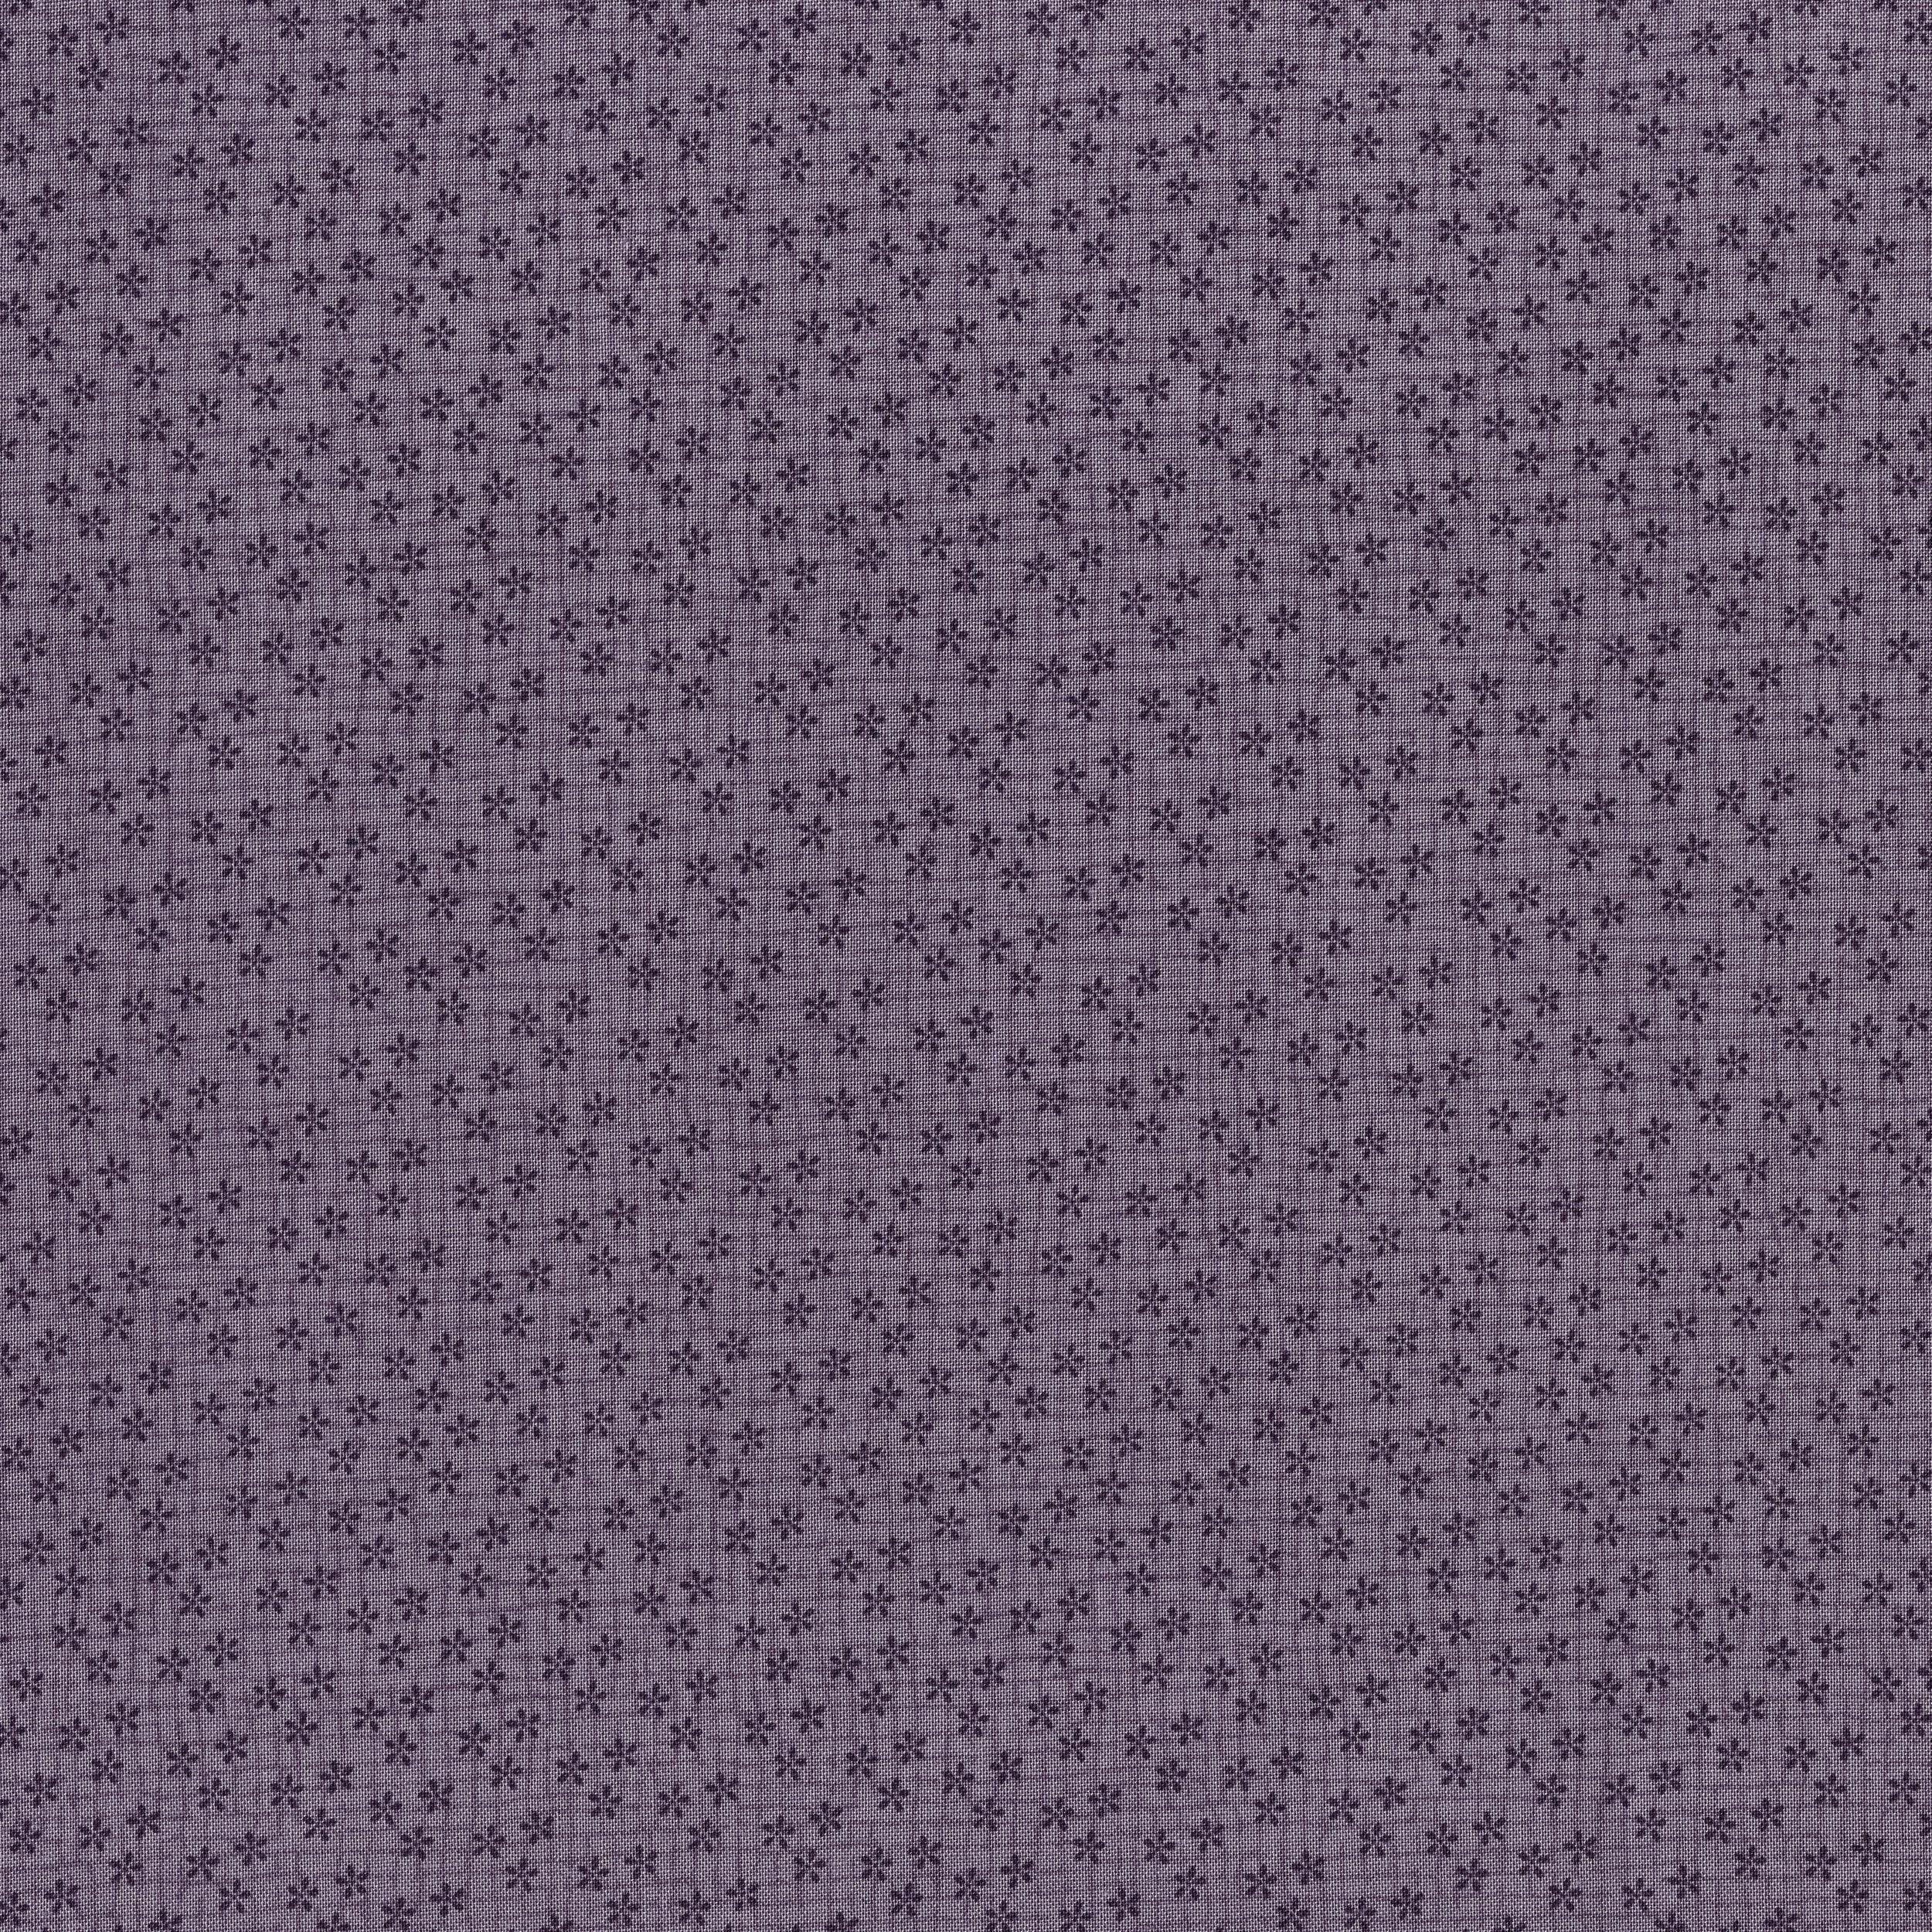 3203-001 SEASIDE DAISIES-LILAC